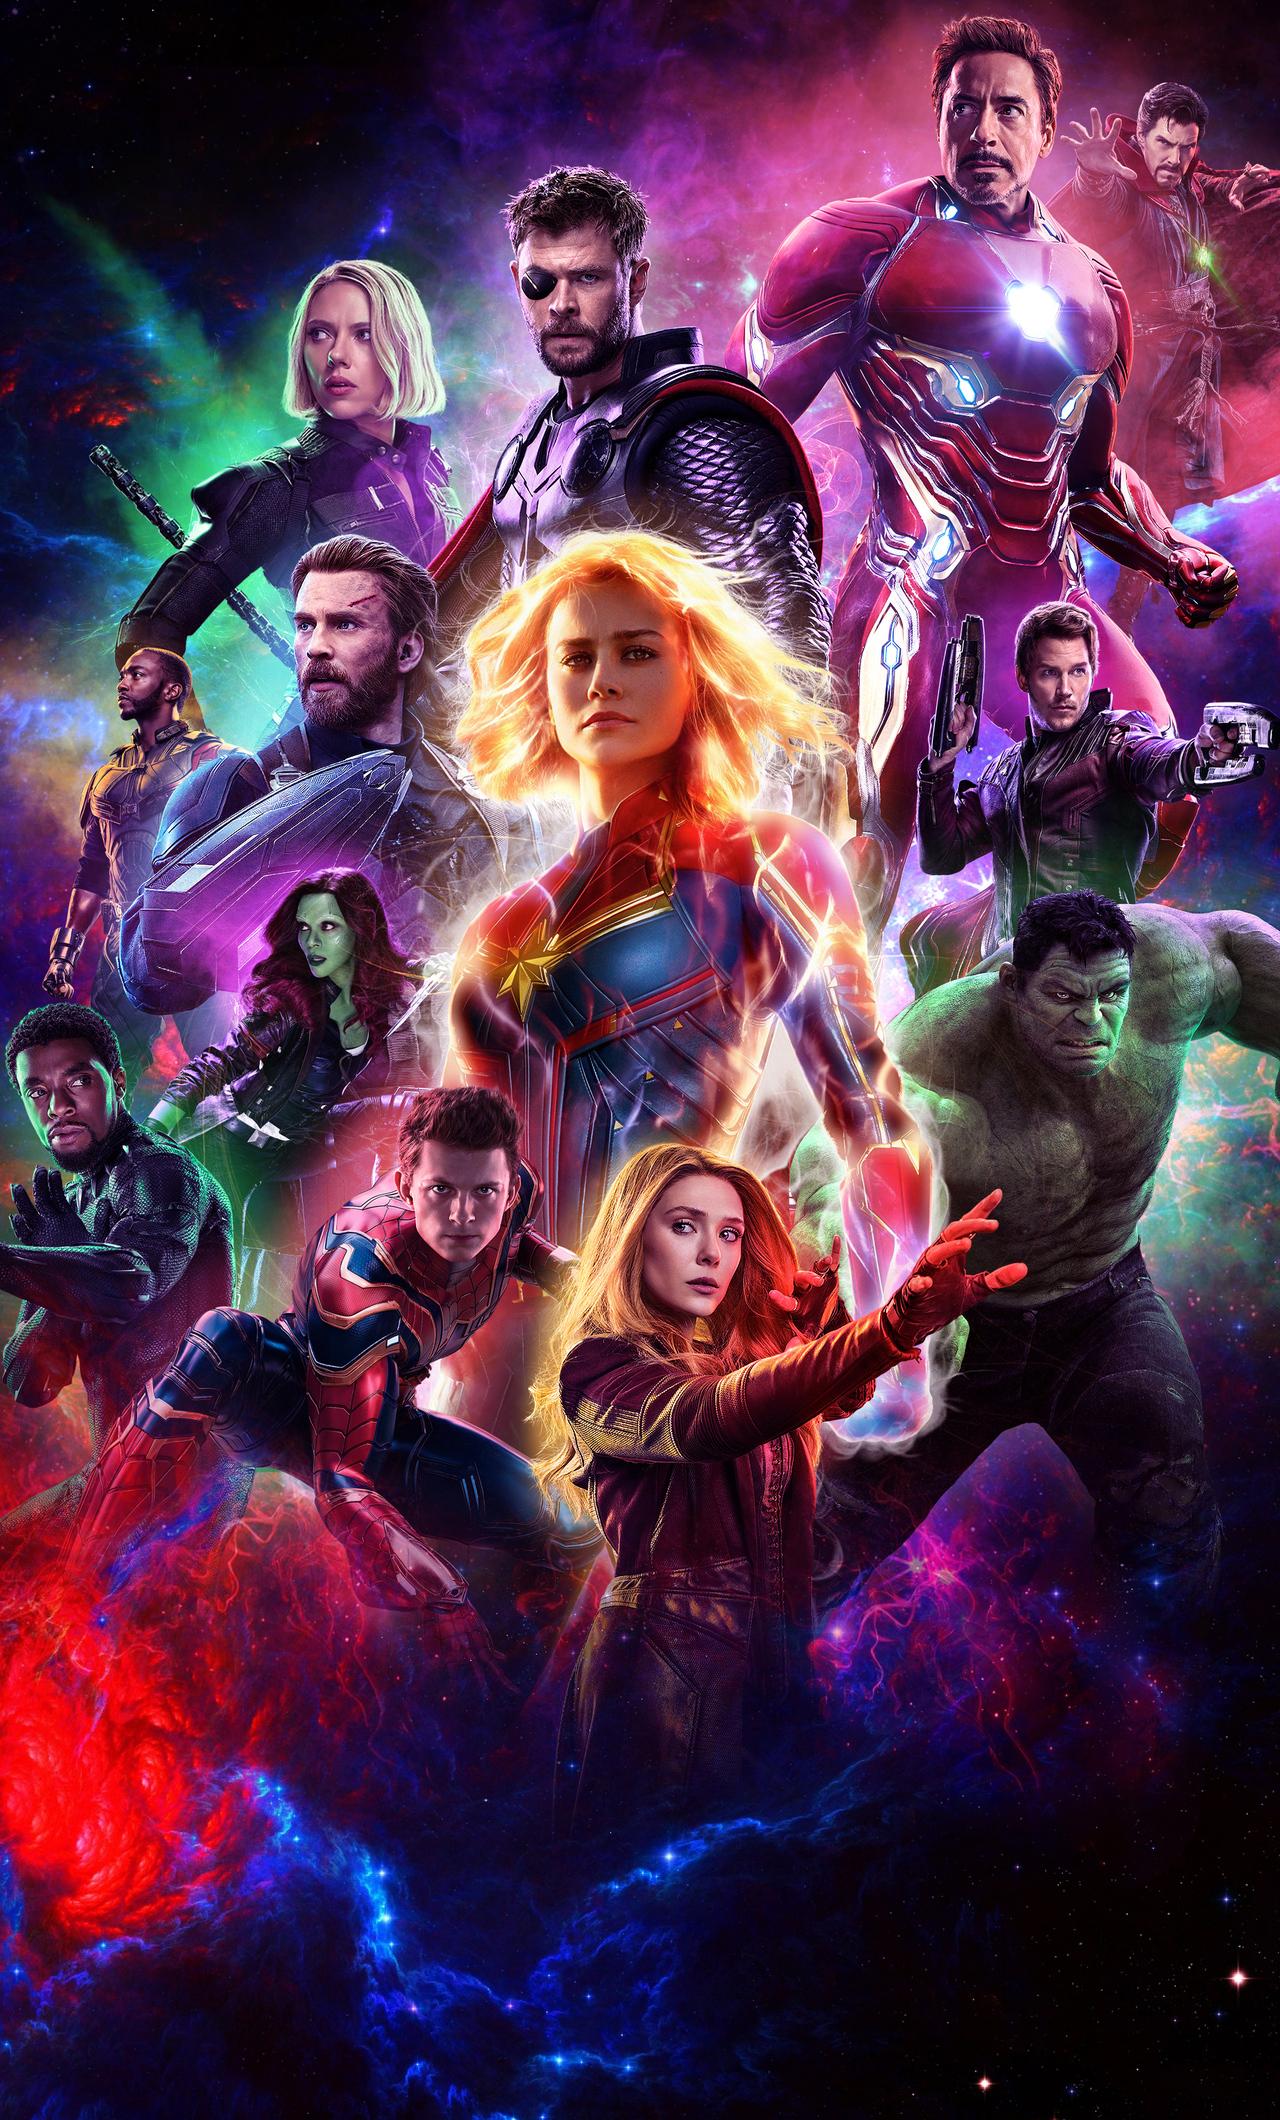 1280x2120 Avengers Endgame 2019 iPhone 6+ HD 4k Wallpapers ...